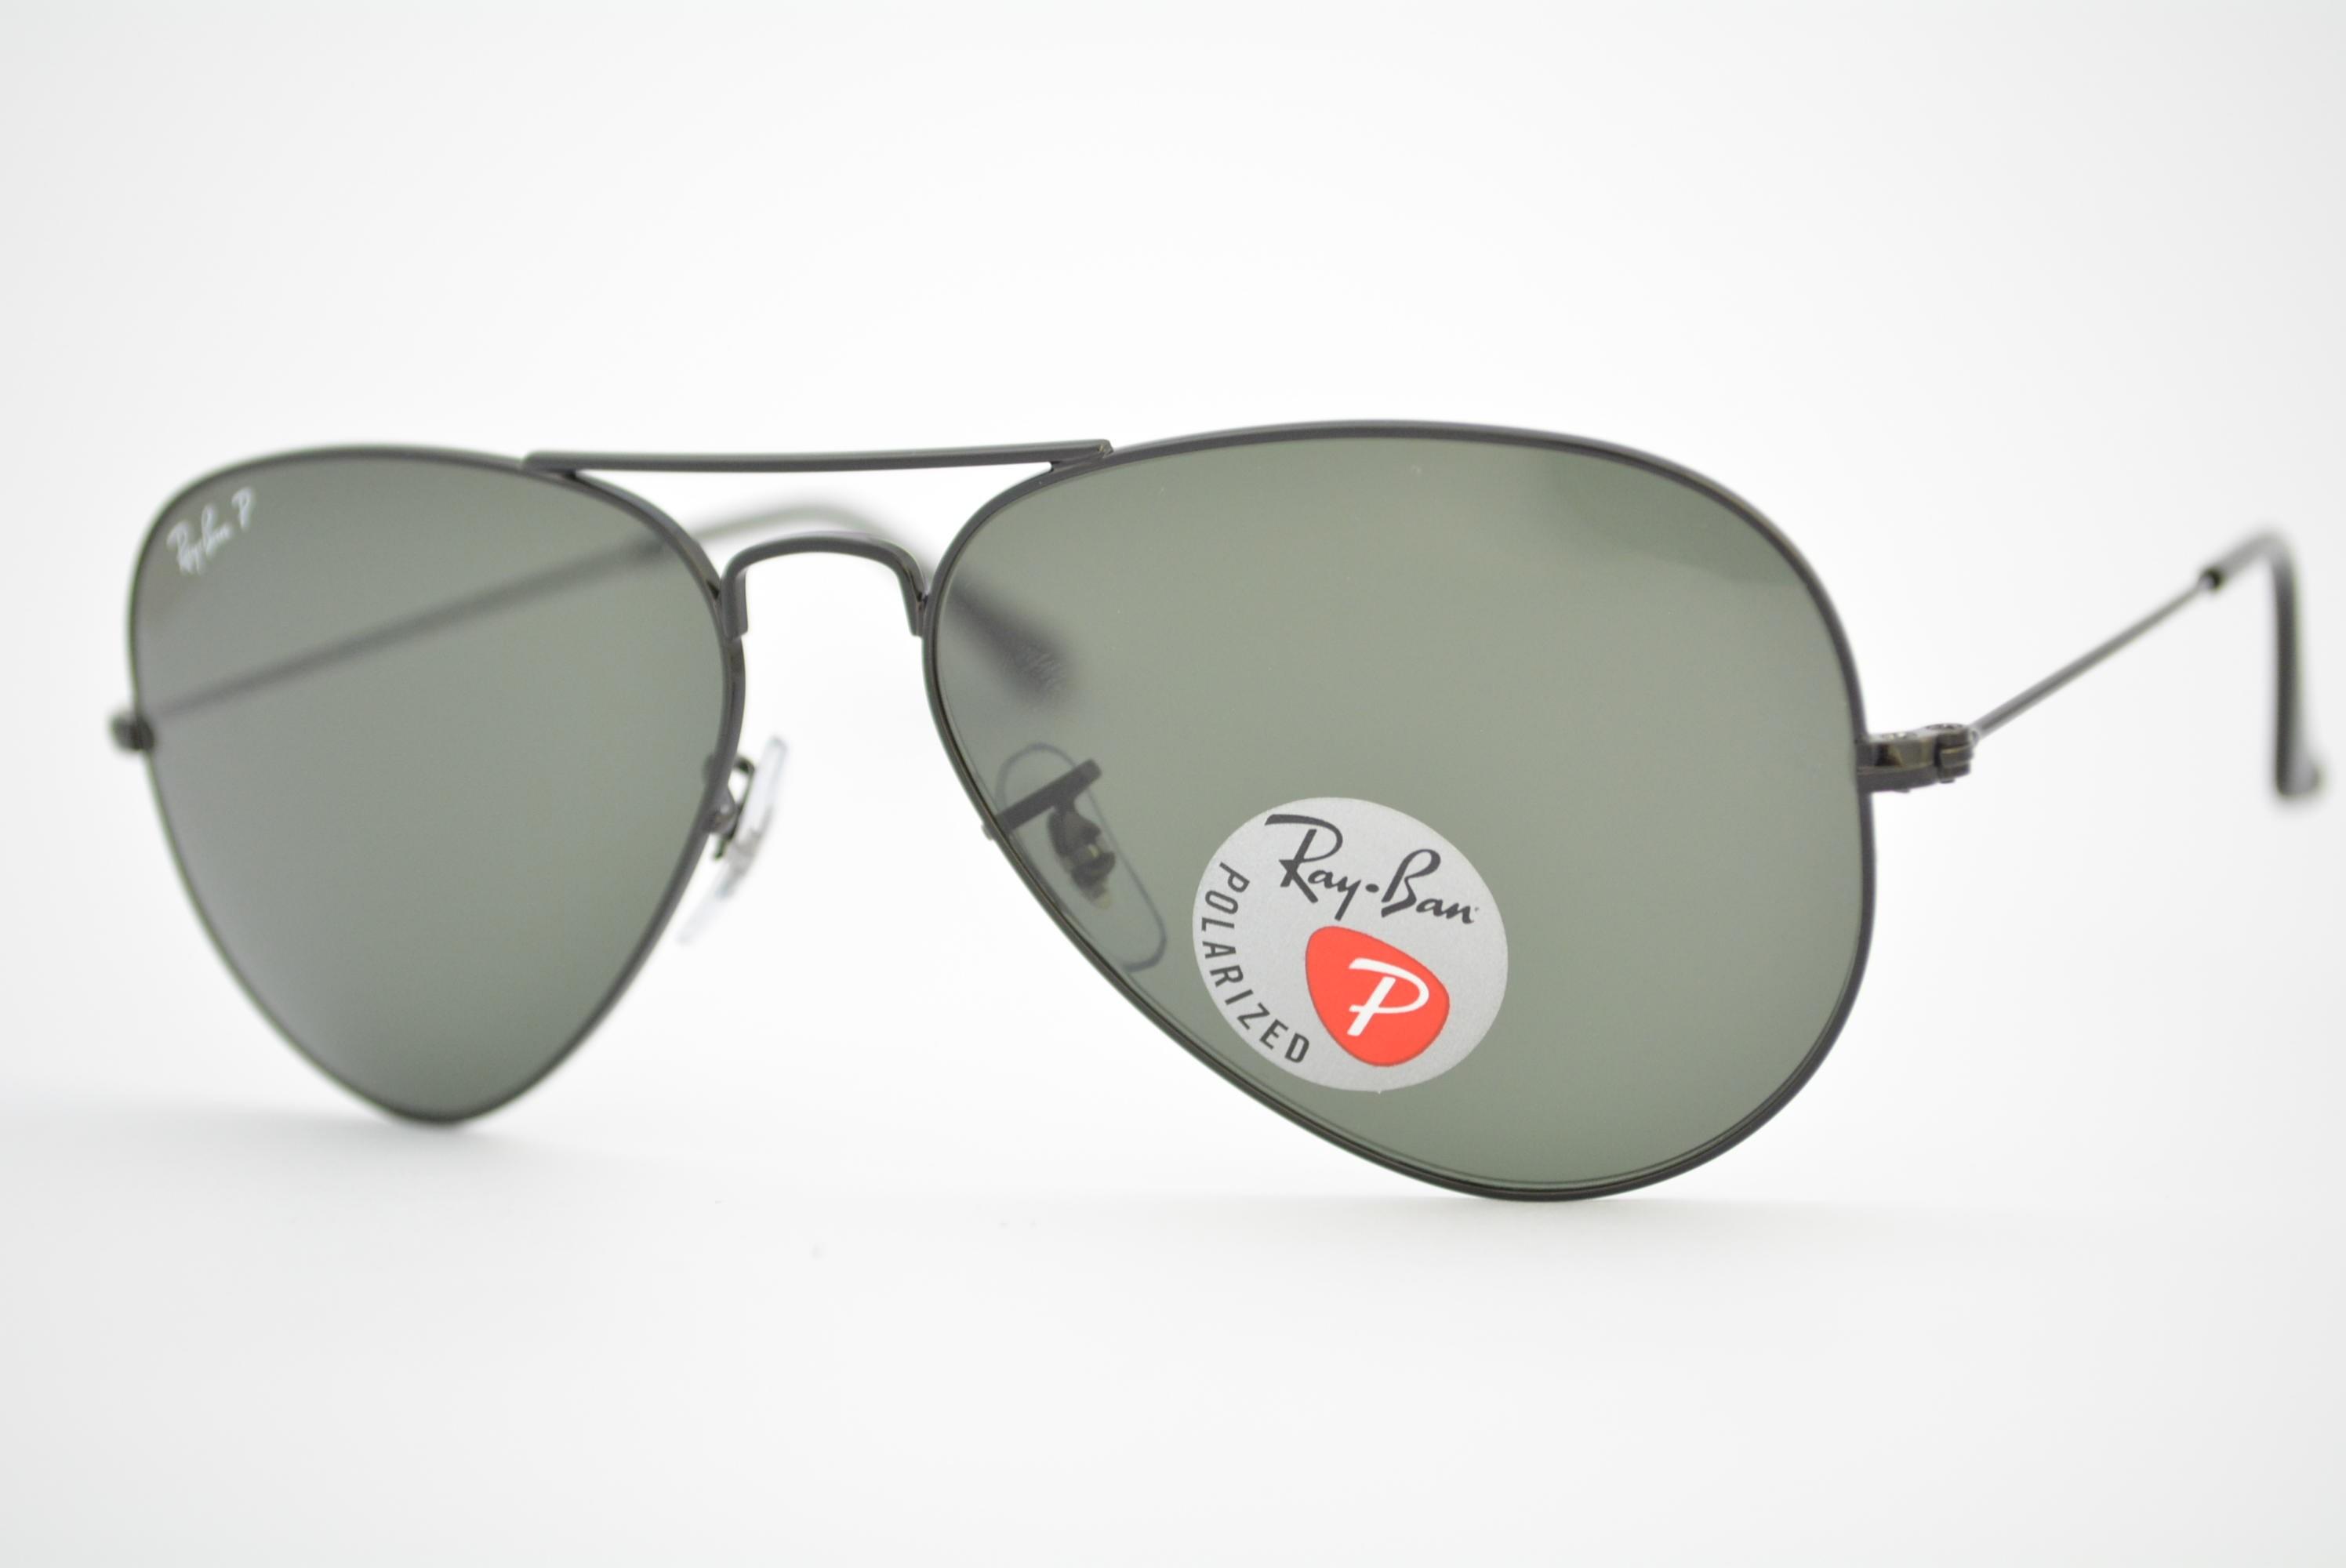 óculos de sol Ray Ban aviator large mod rb3025L 002 58 tamanho 58 polarizado d77a5c838a